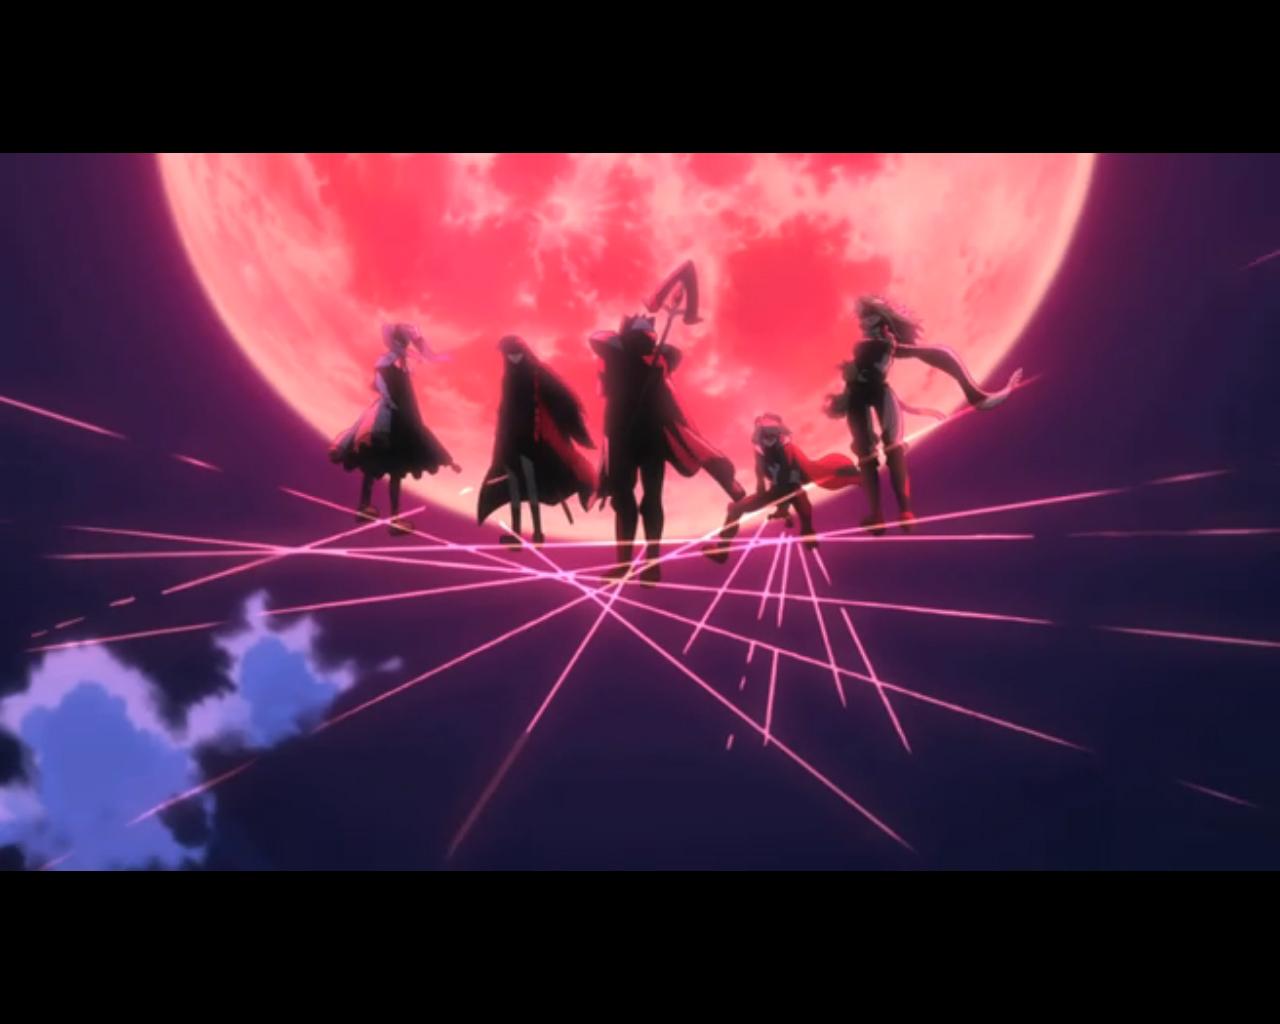 Akame ga Kill: Episode 01 Review